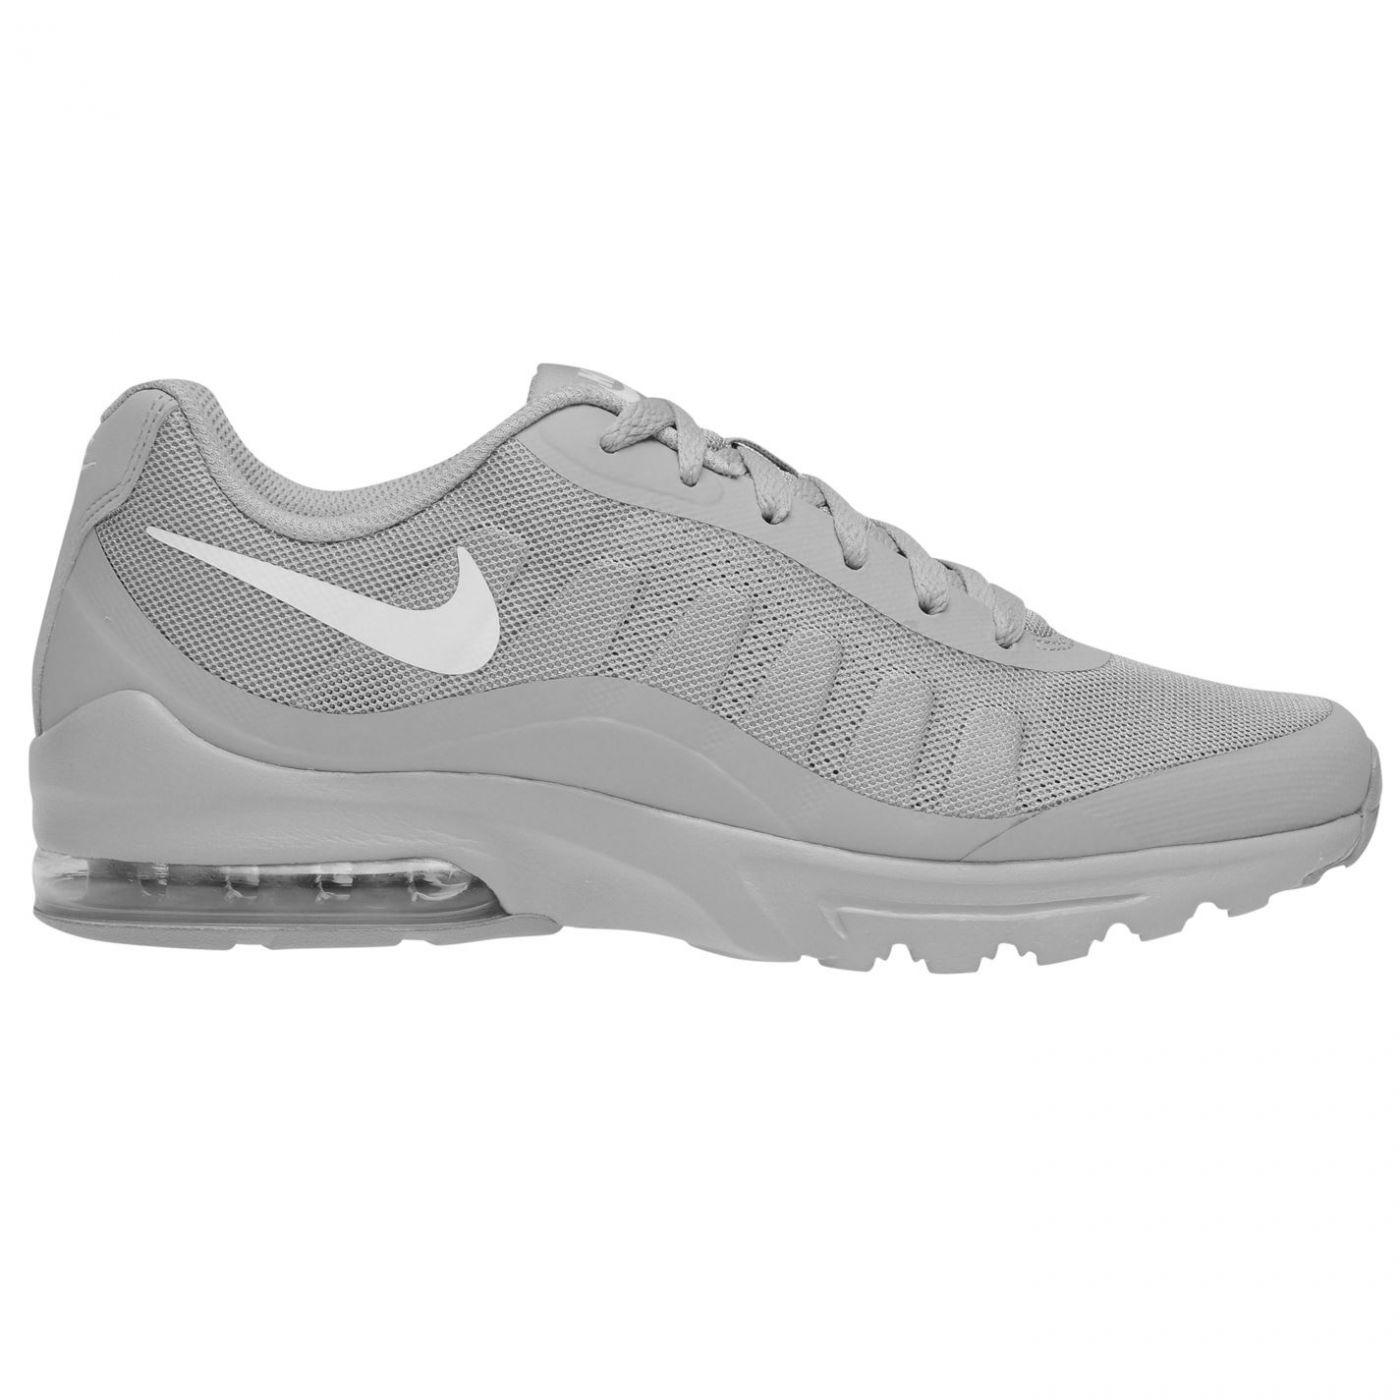 Men's trainers Nike Nike Air Max Invigor